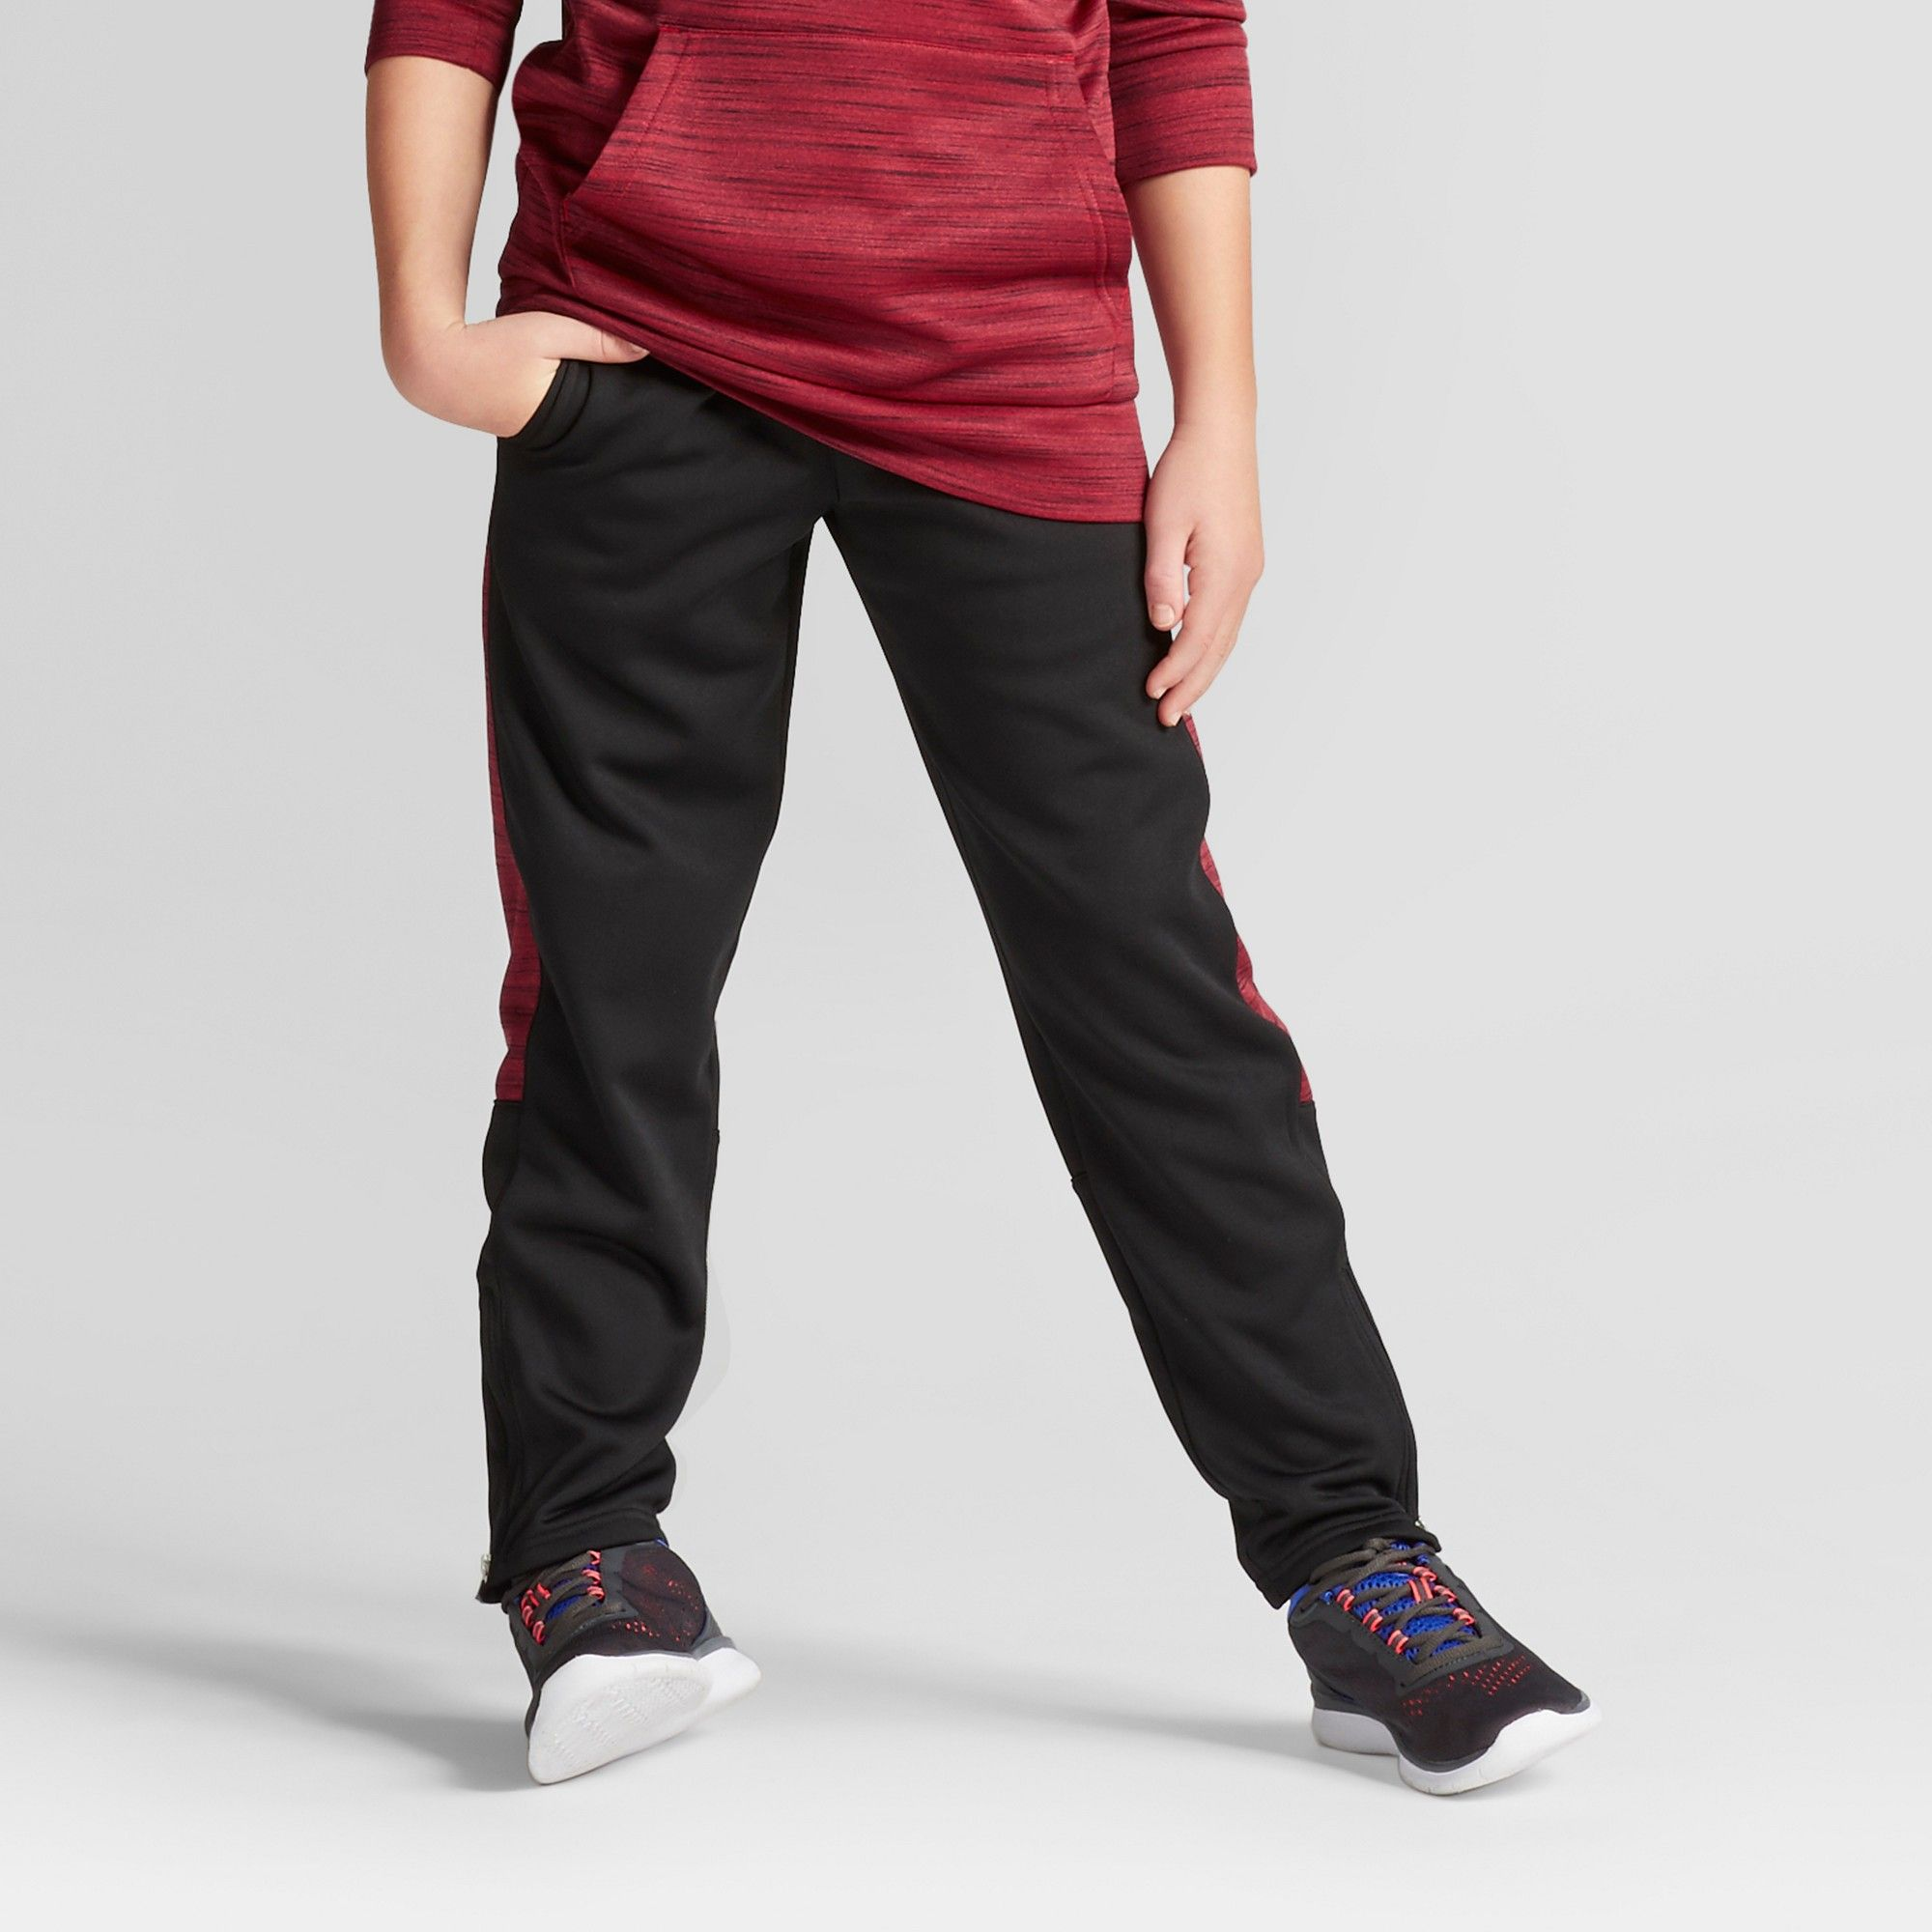 Boys cozy tech fleece jogger pants c9 champion red xs